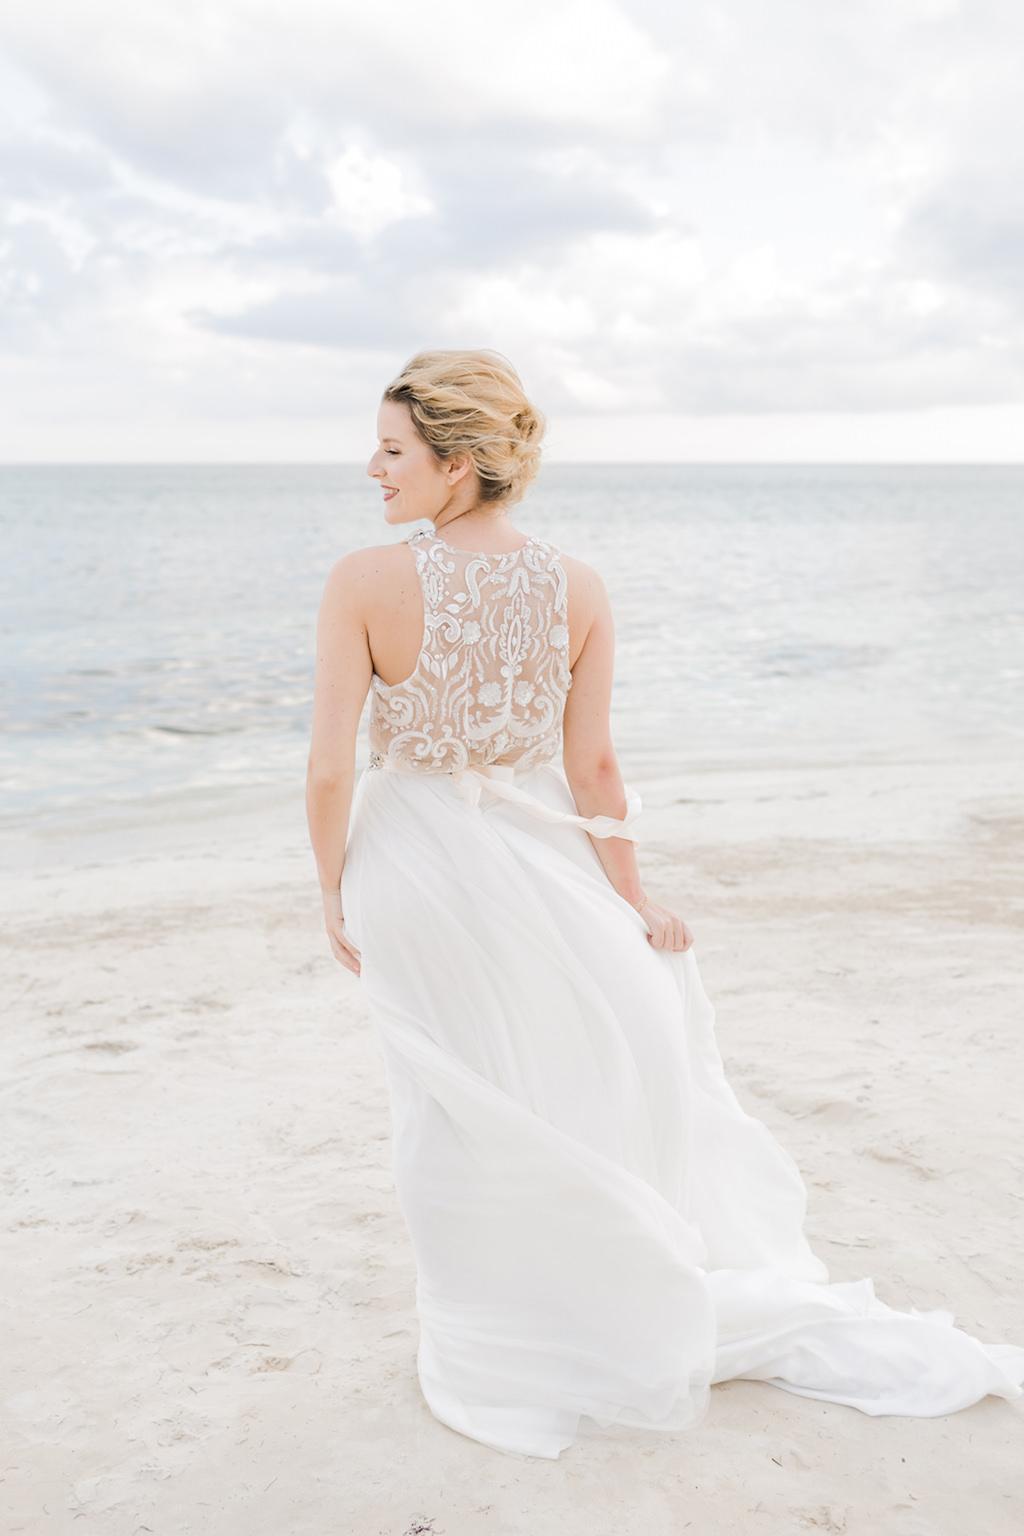 Sandals South Coast Jamaica Destination Caribbean Wedding | Alexis June Weddings